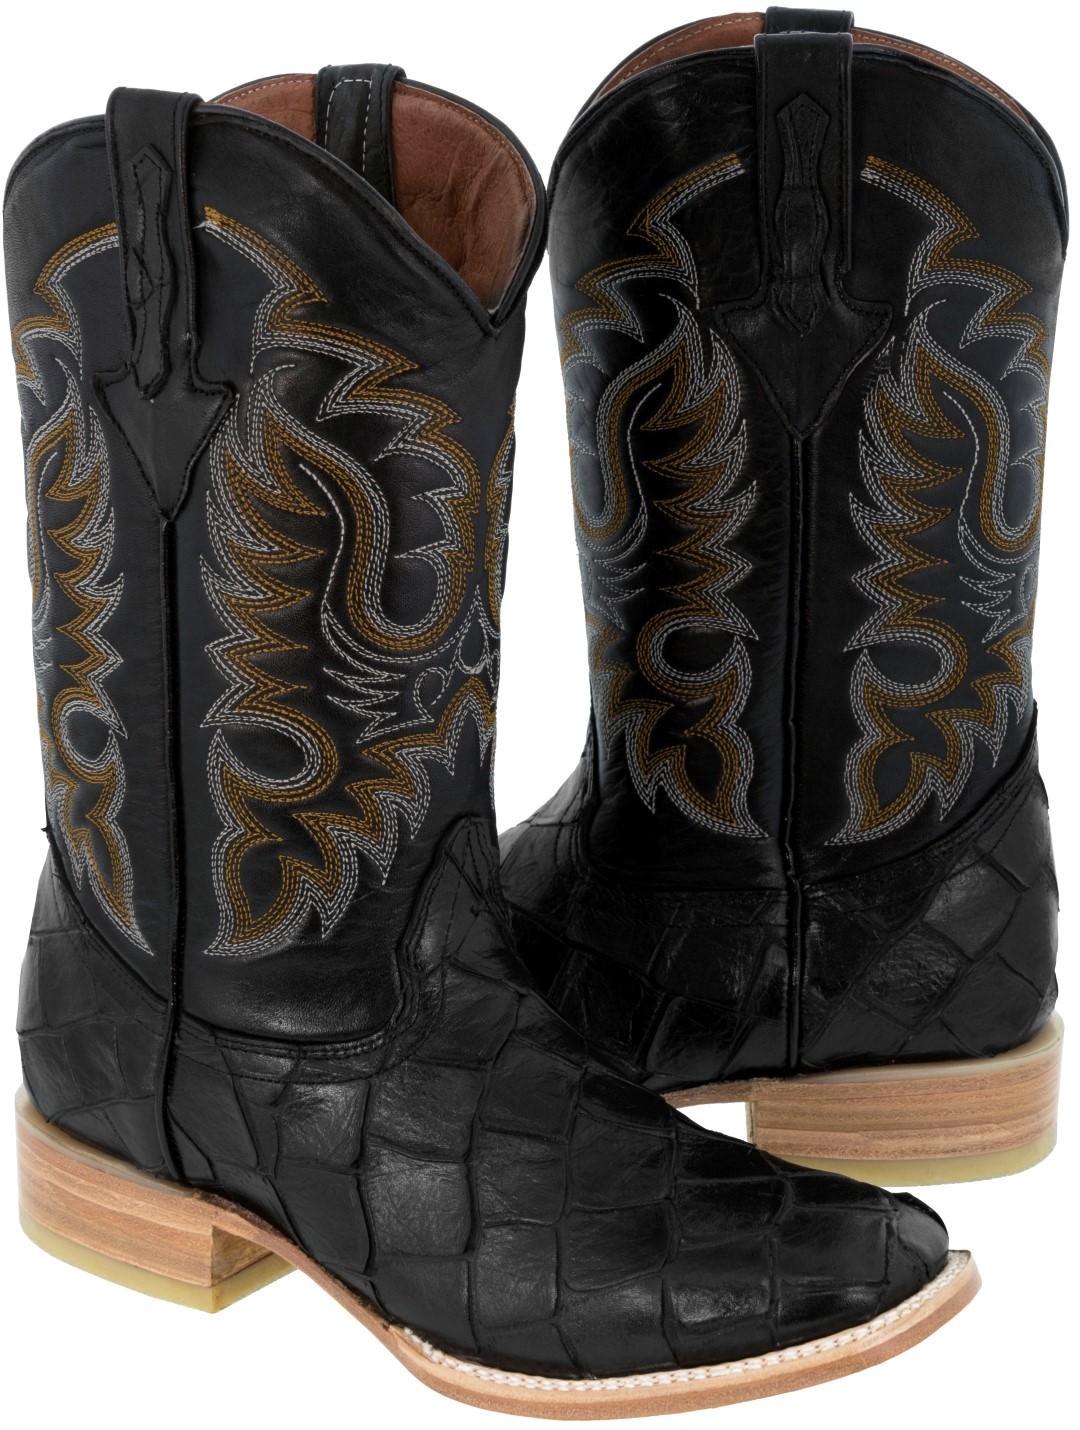 Men 39 s black fish pirarucu design leather cowboy boots for Pirarucu fish boots